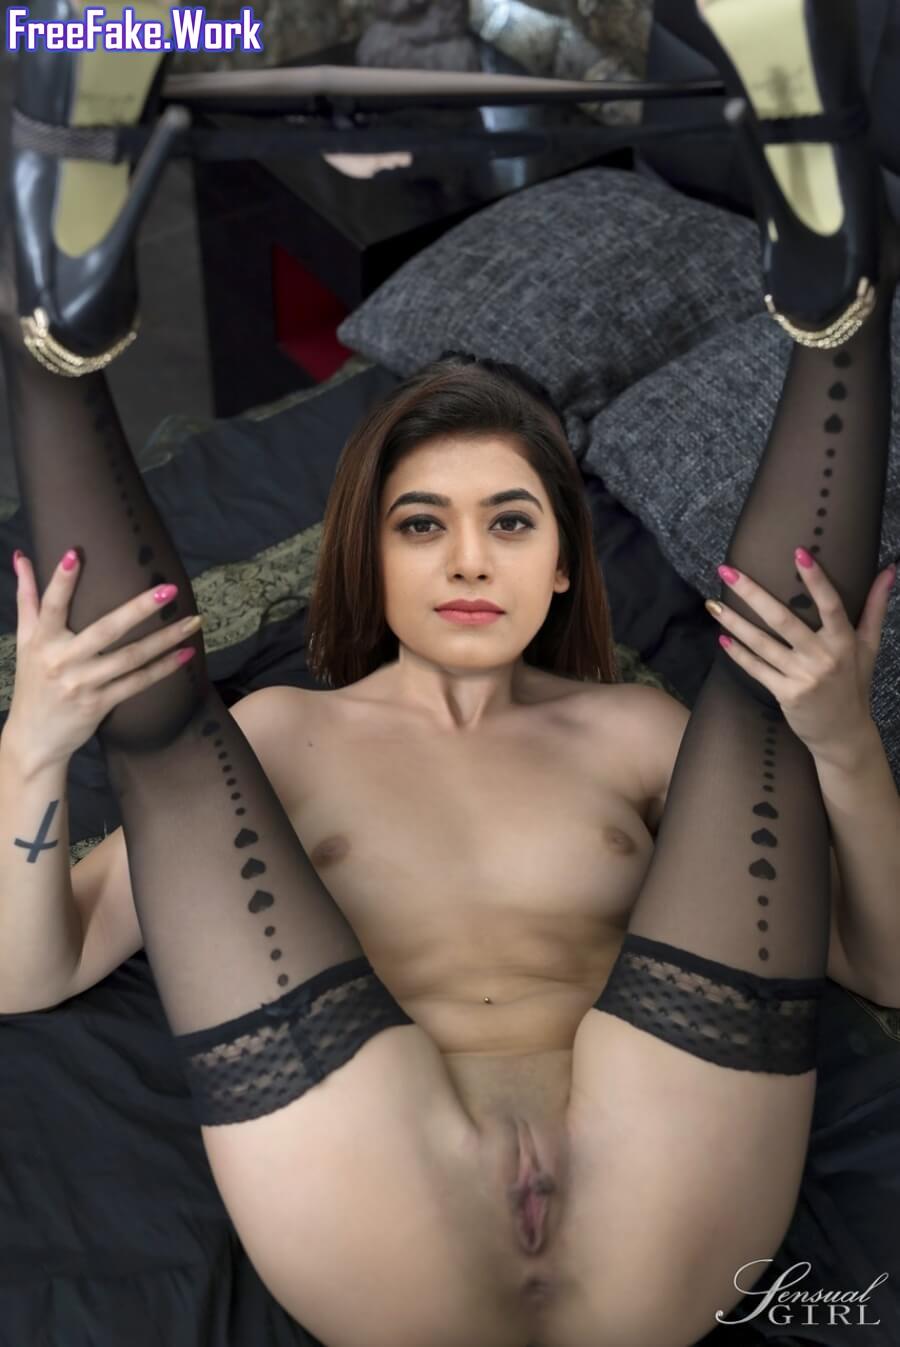 Yamini-Bhaskar-spreading-her-leg-in-black-stocking-showing-shaved-pussy.jpg